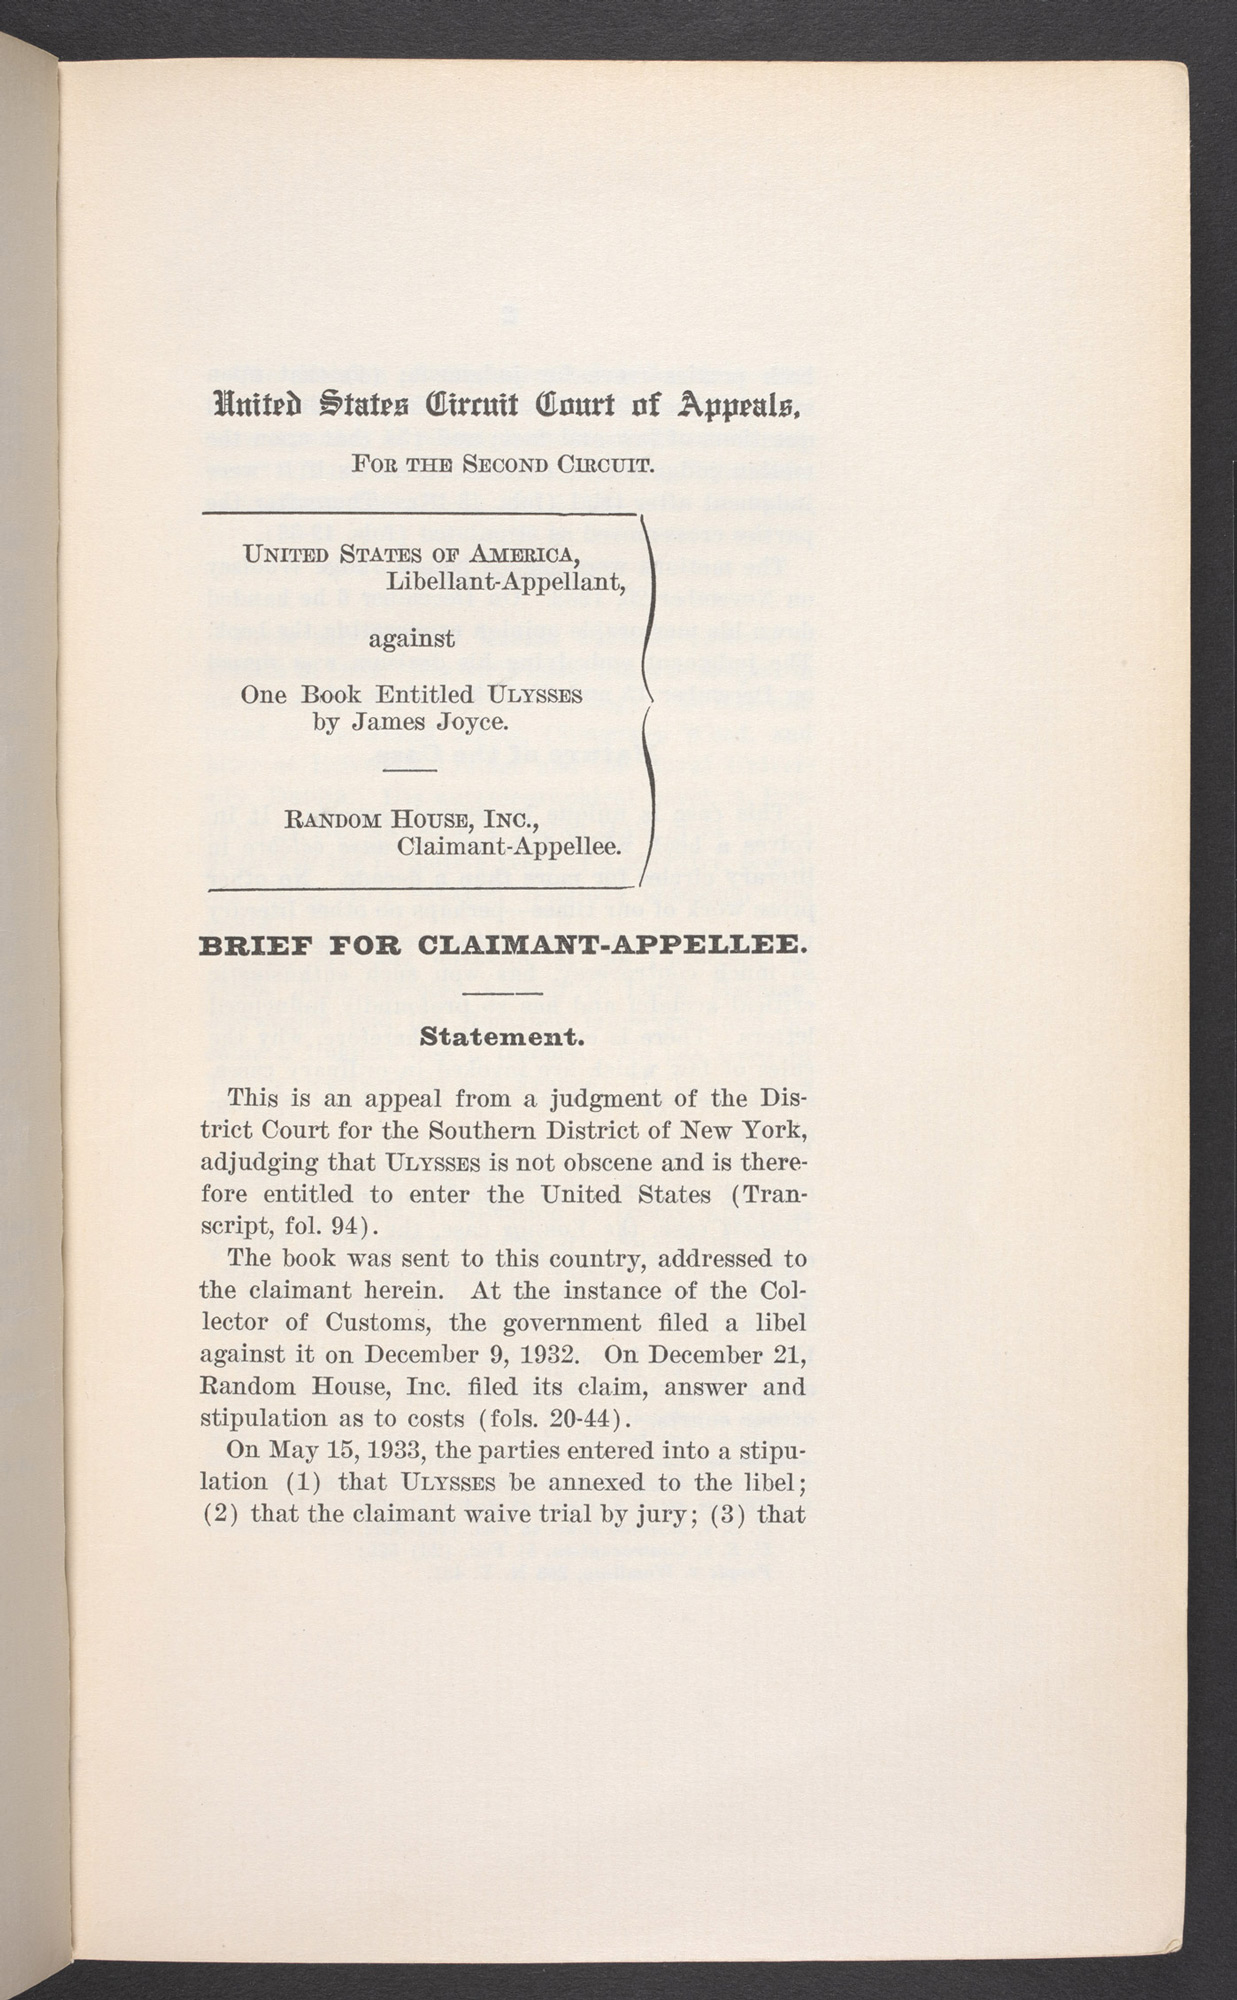 Legal notes prepared for United States v. One Book Entitled Ulysses, 1934